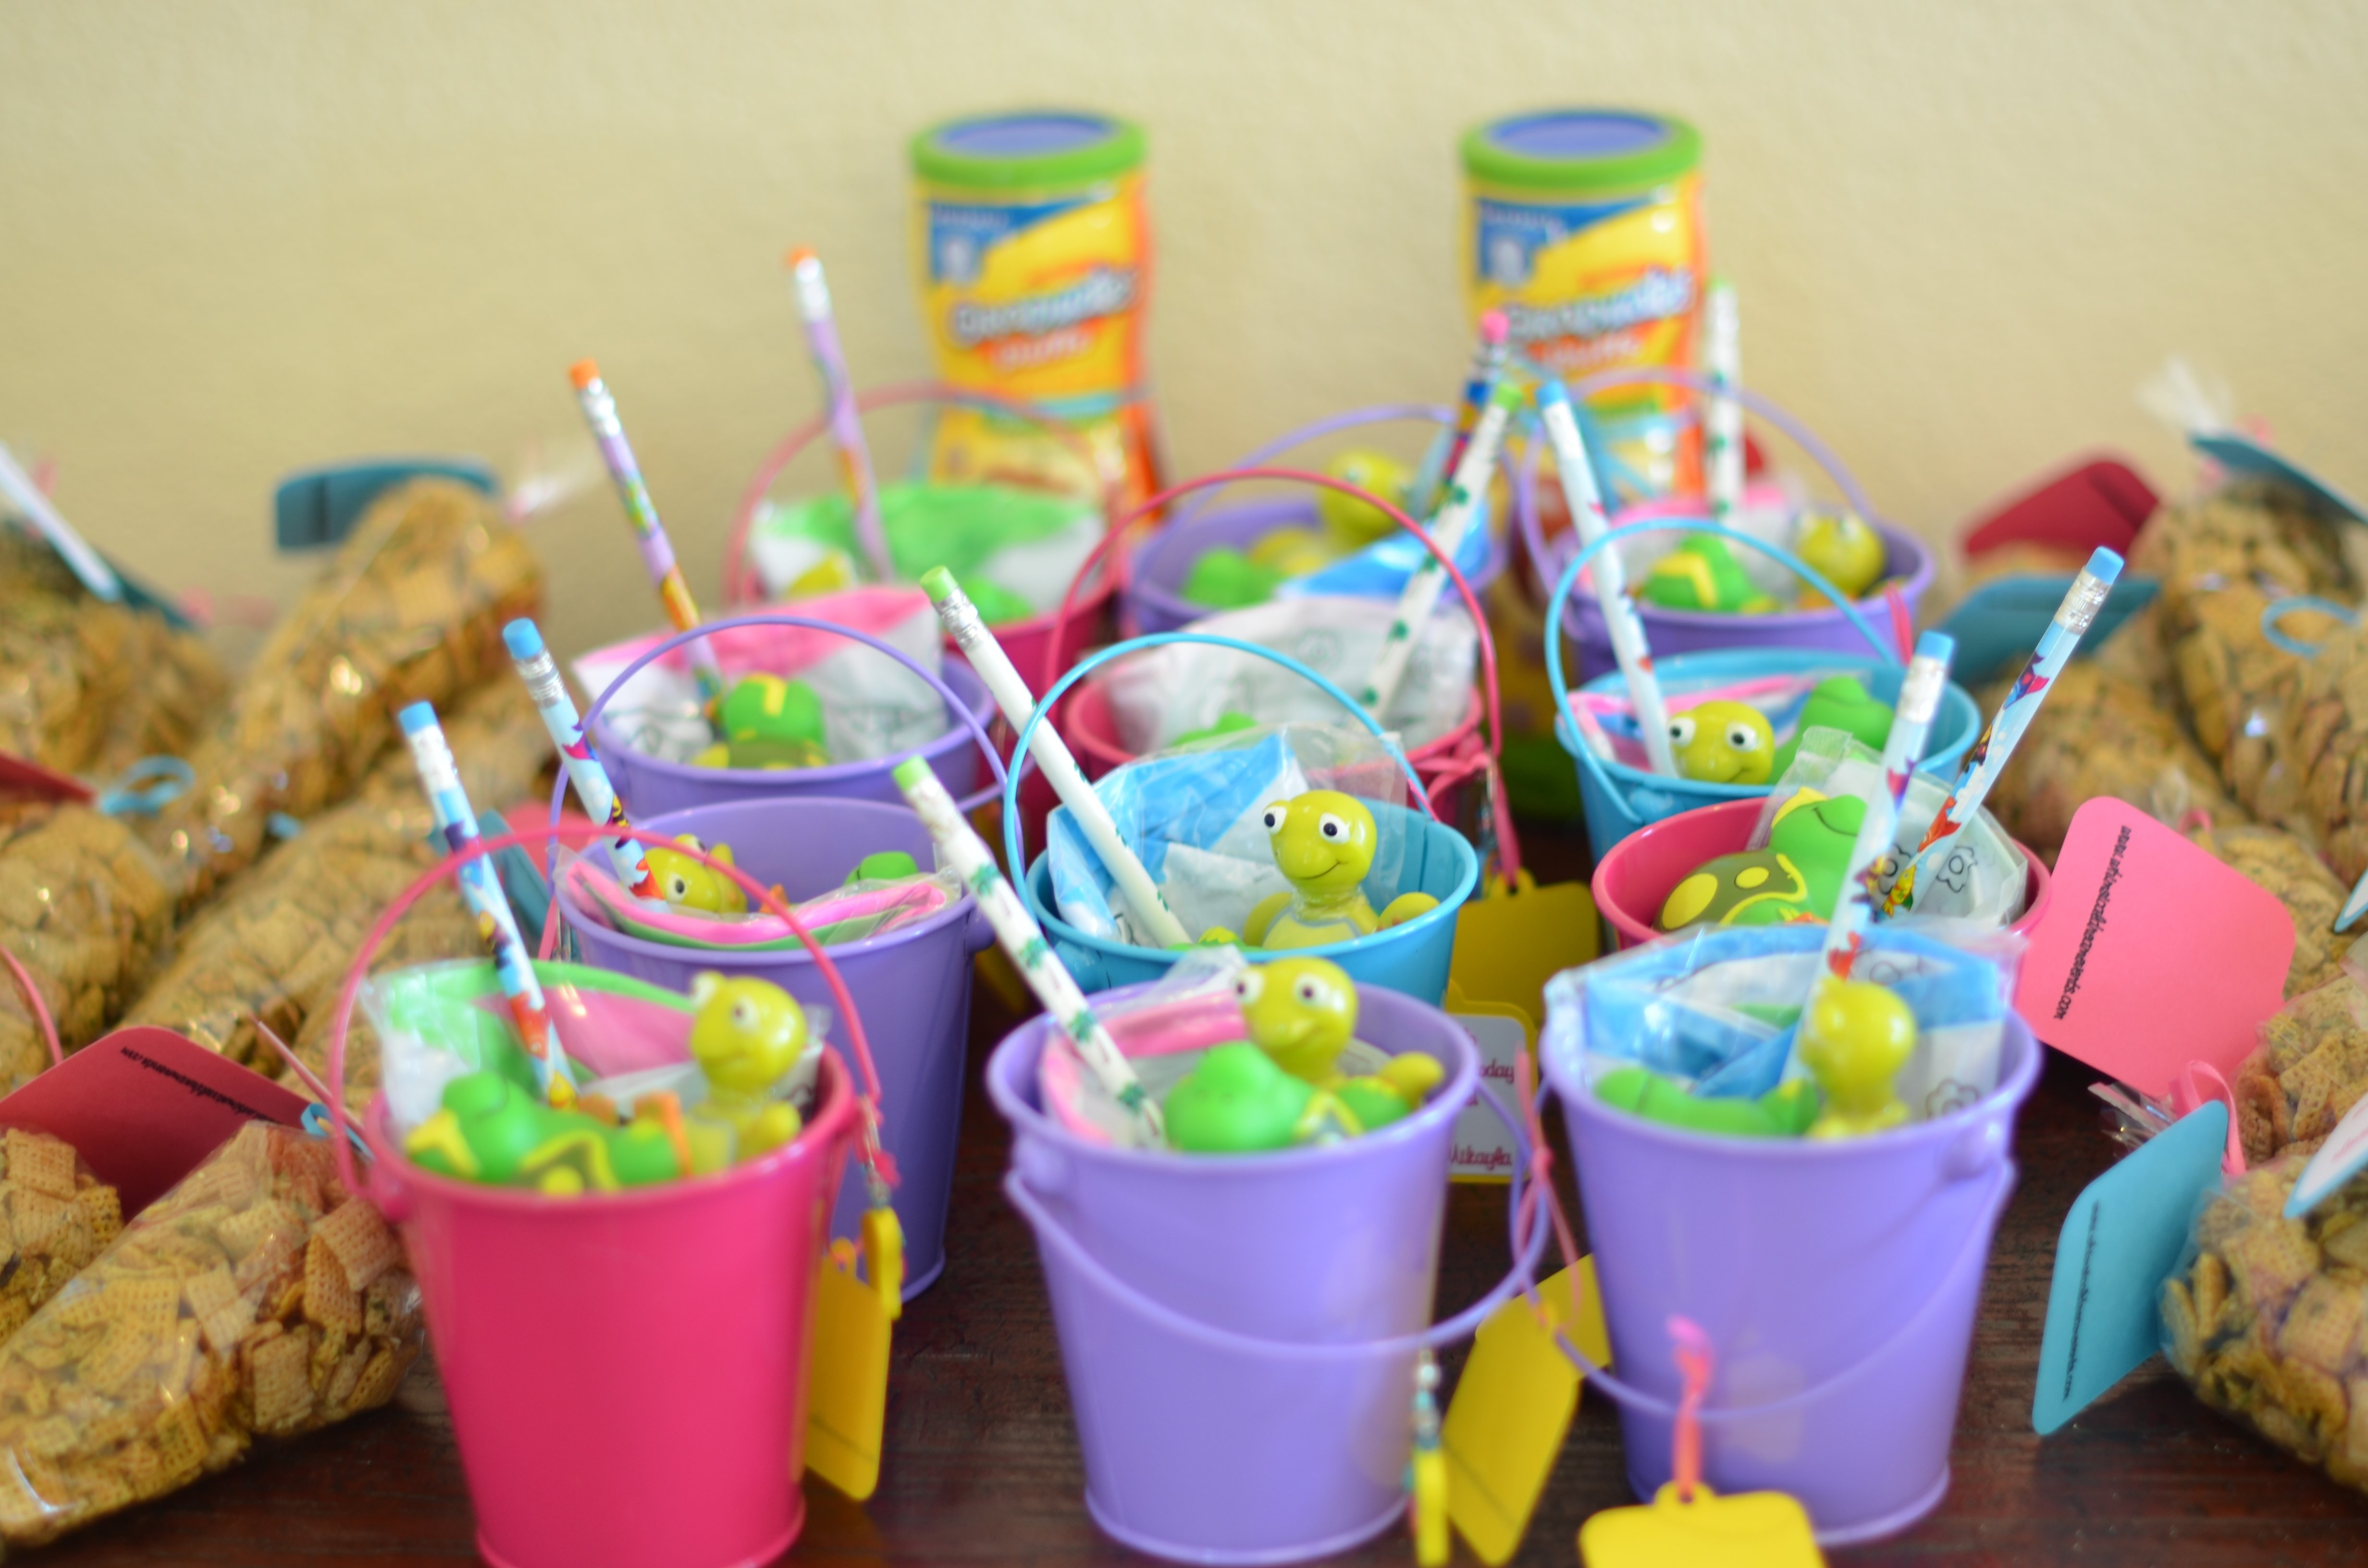 10 Nice Goodie Bag Ideas For Kids stunning goodie bag ideas for kids birthday parties 50 together with 2 2020